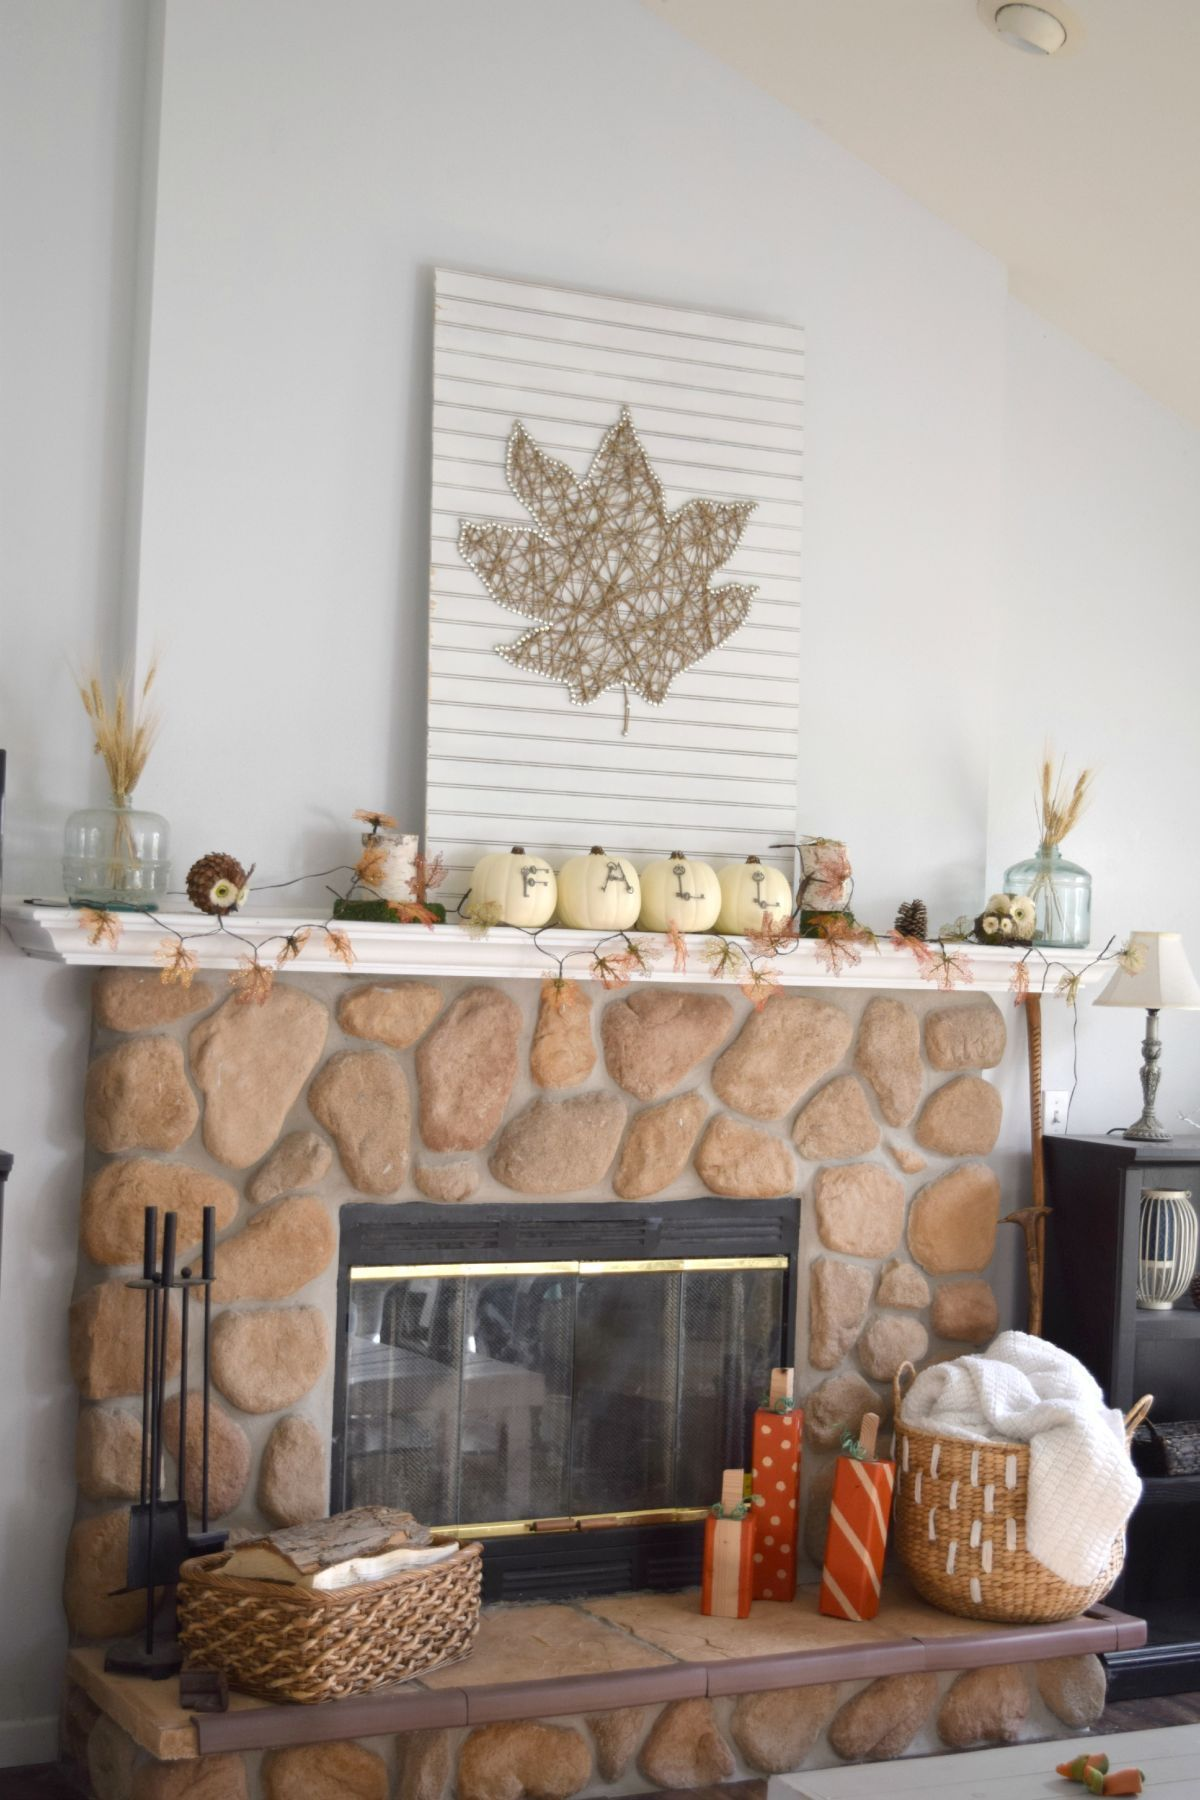 Trend Spotting Rocks for the Homeus Interior Mantels decor